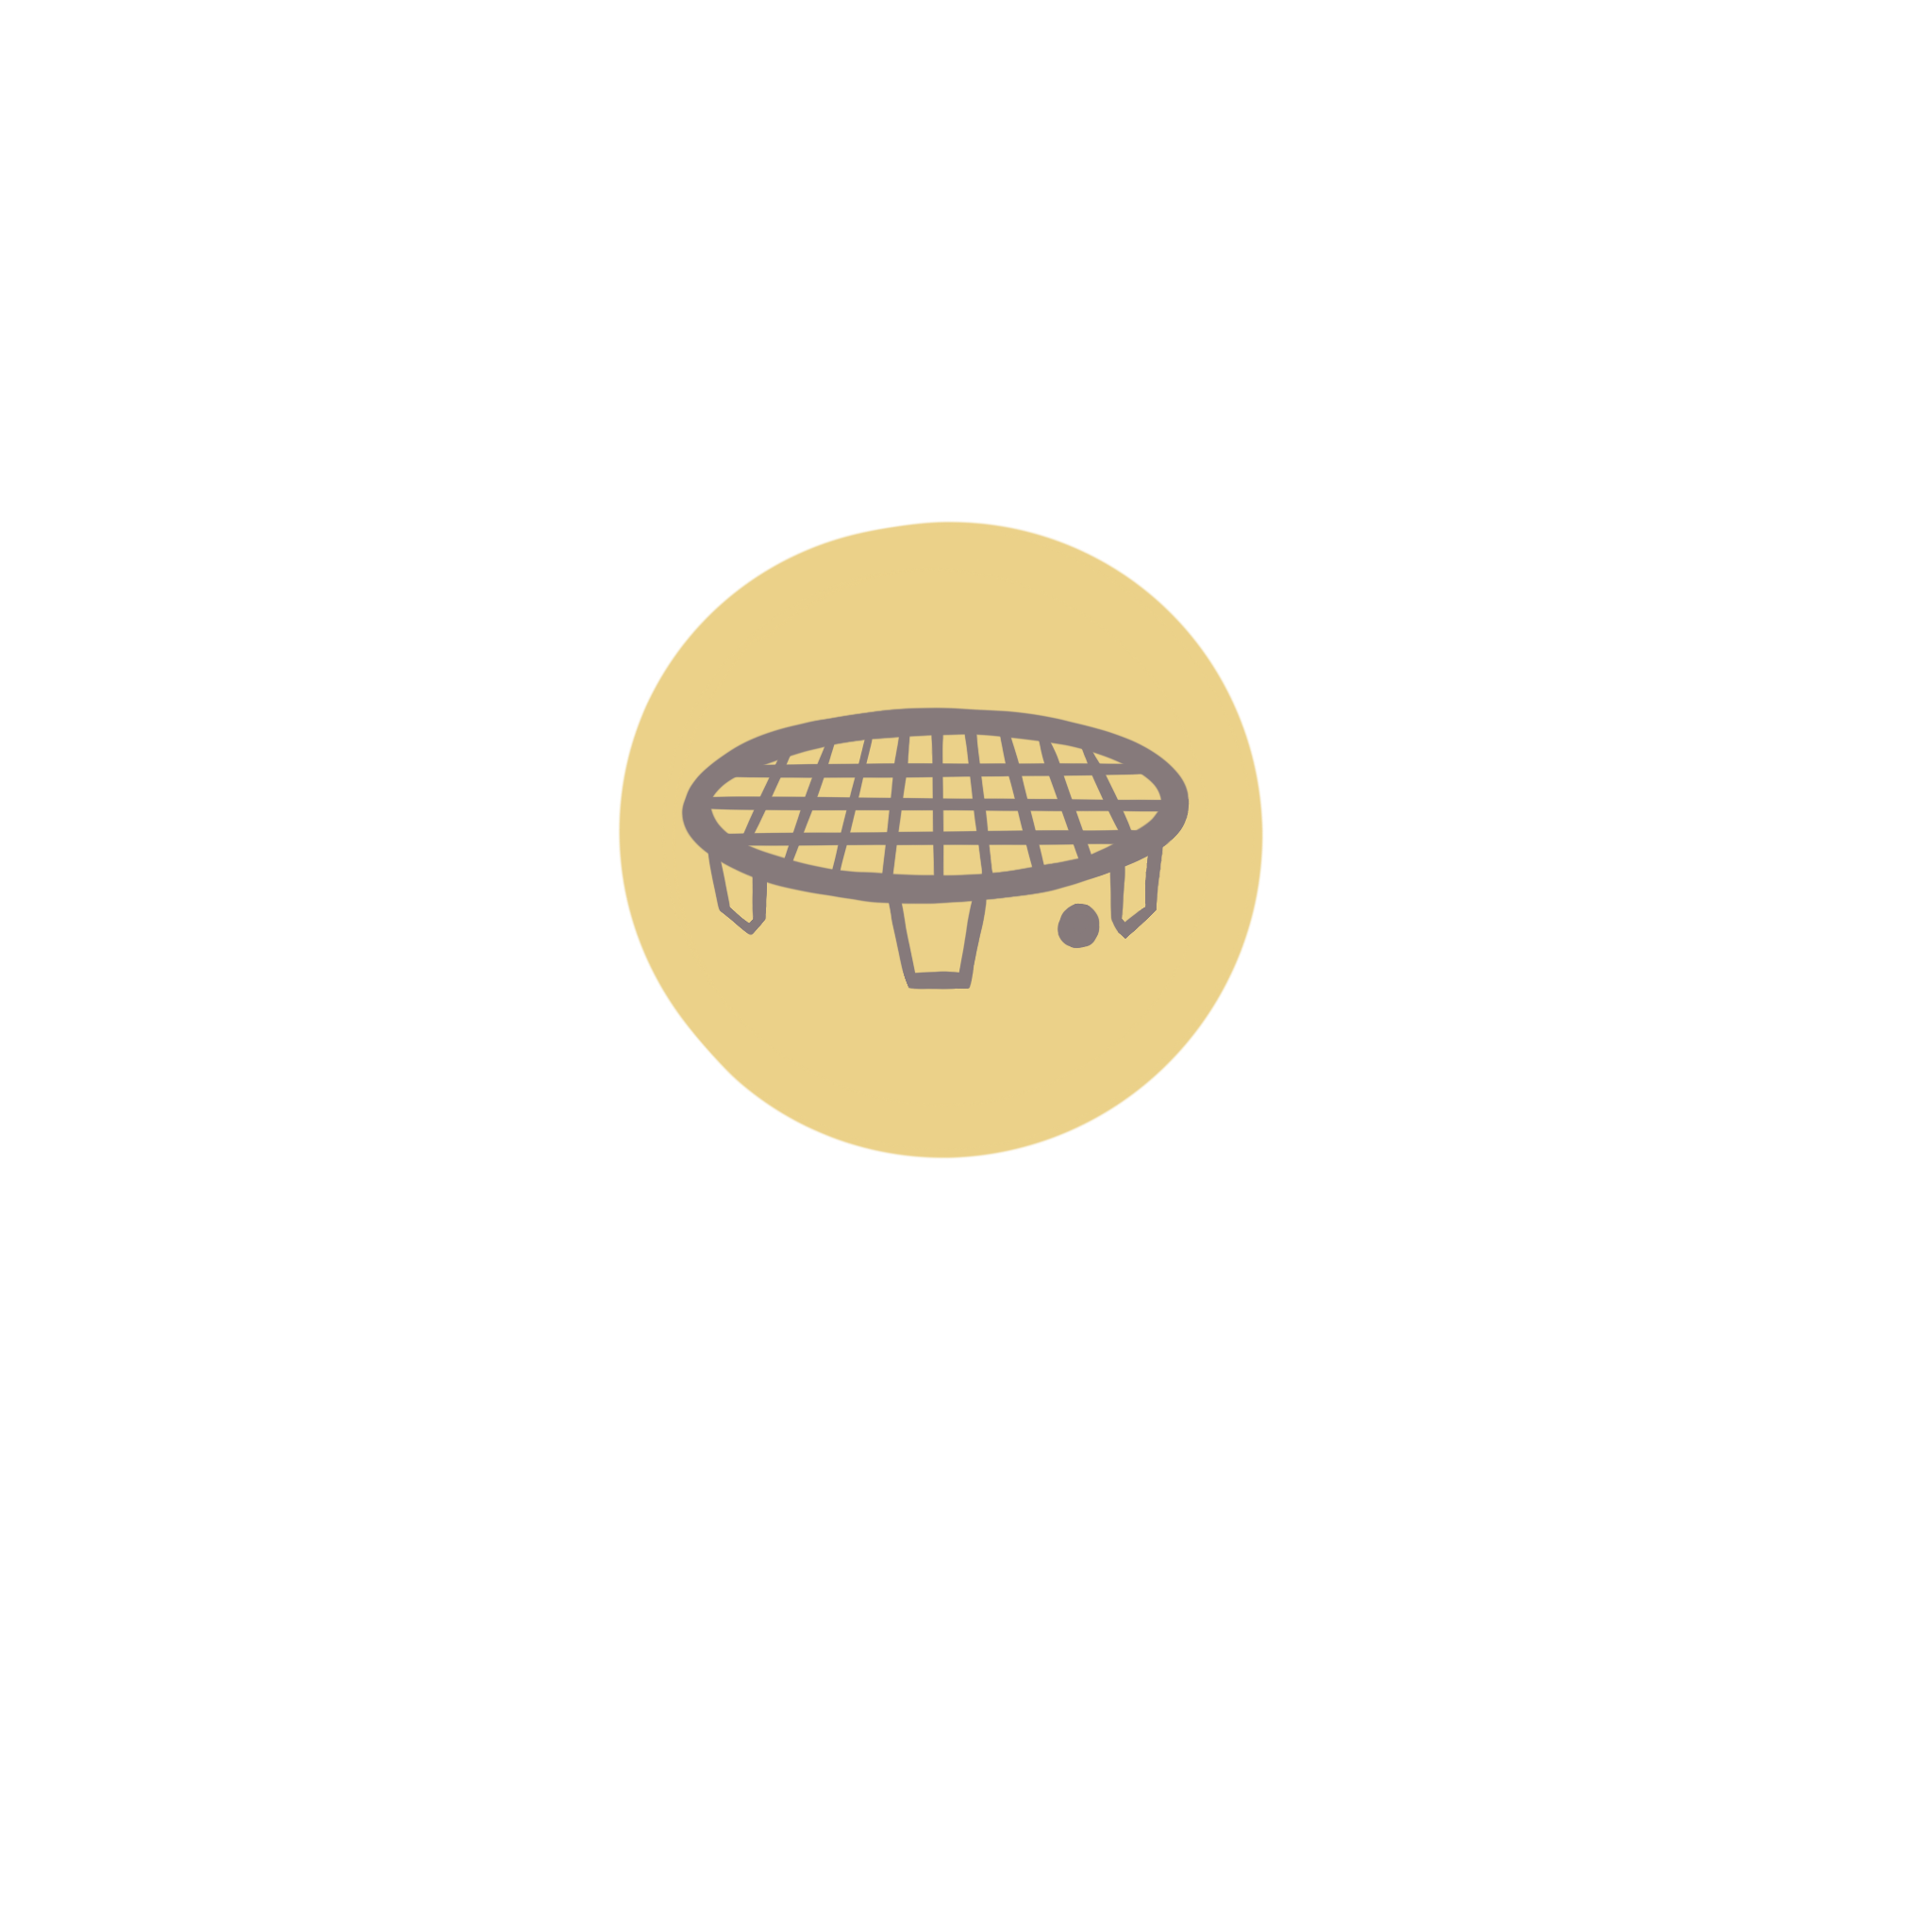 illustration of a spikeball net